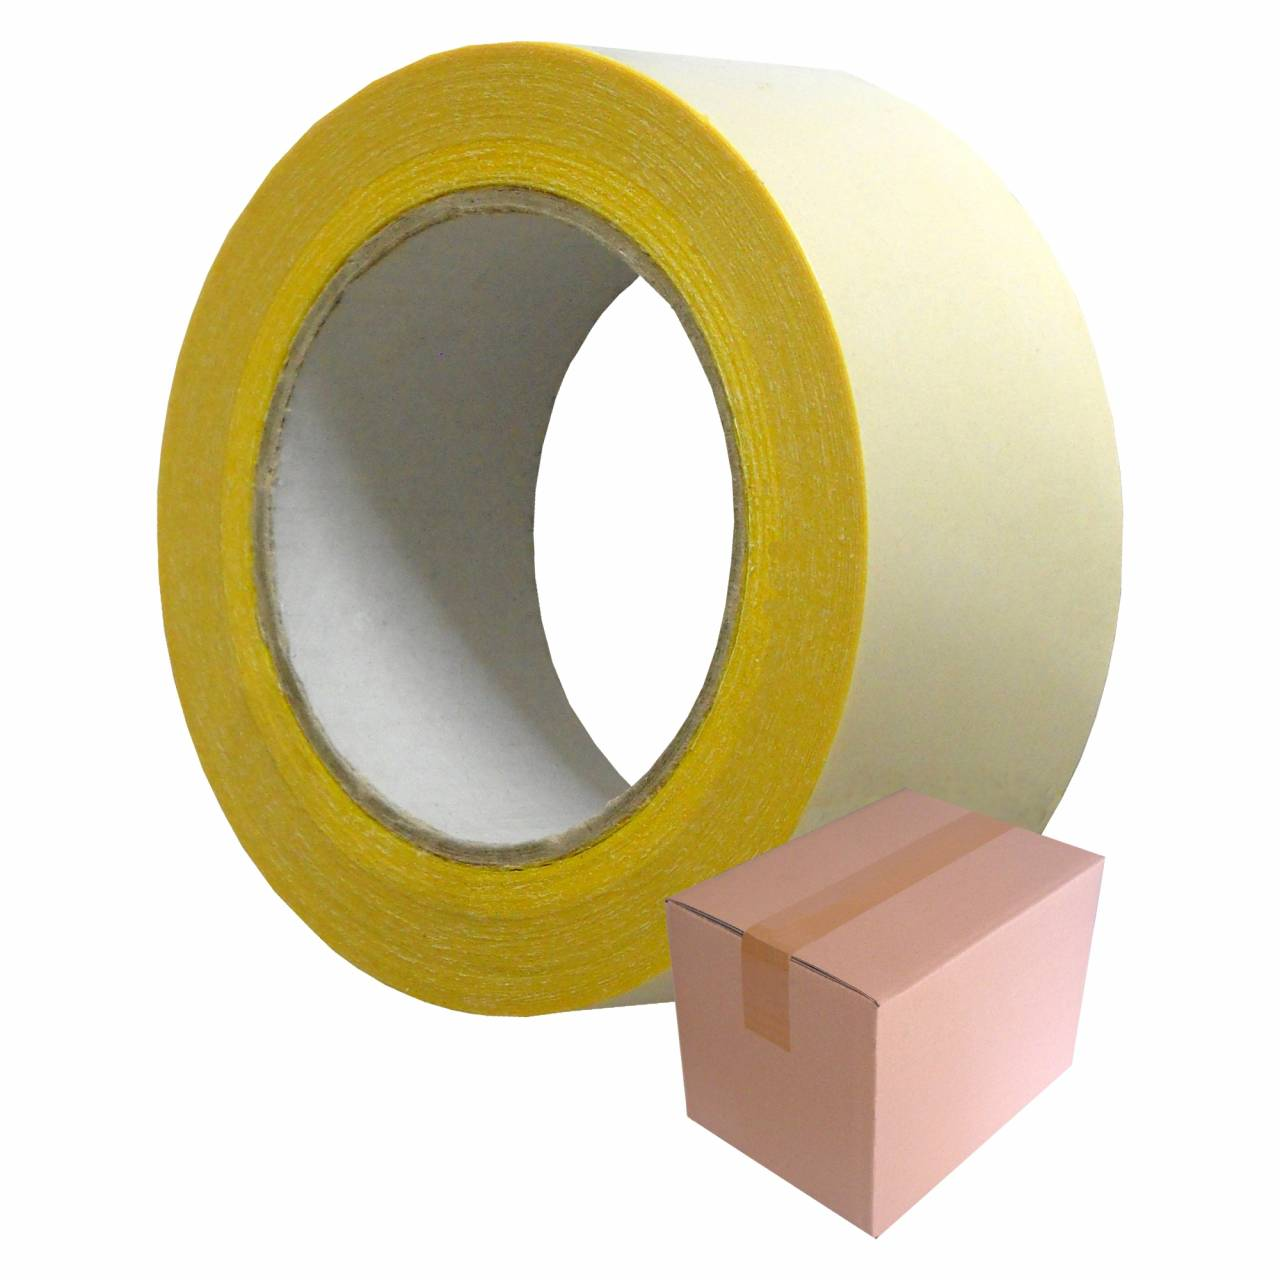 SAFETY-Tape T305 gelb-phosphorierend, 50 mm x 18 m / Rolle